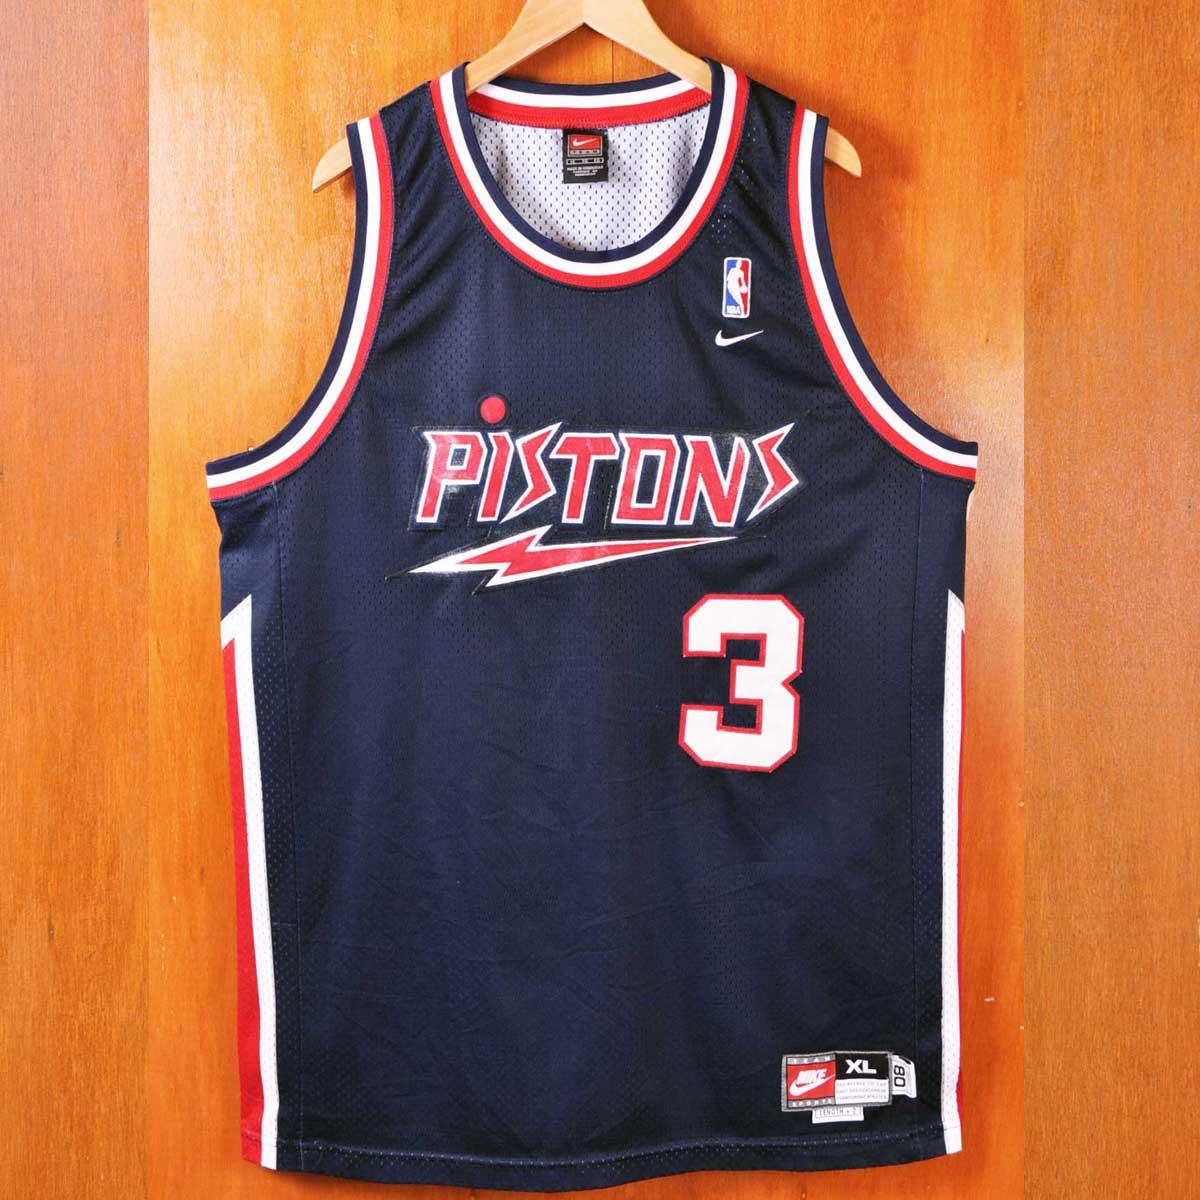 hot sale online f8655 70eb6 NIKE Nike NBA Detroit Pistons Detroit Pistons Ben Wallace basketball tank  top uniform numbering navy men XL▼